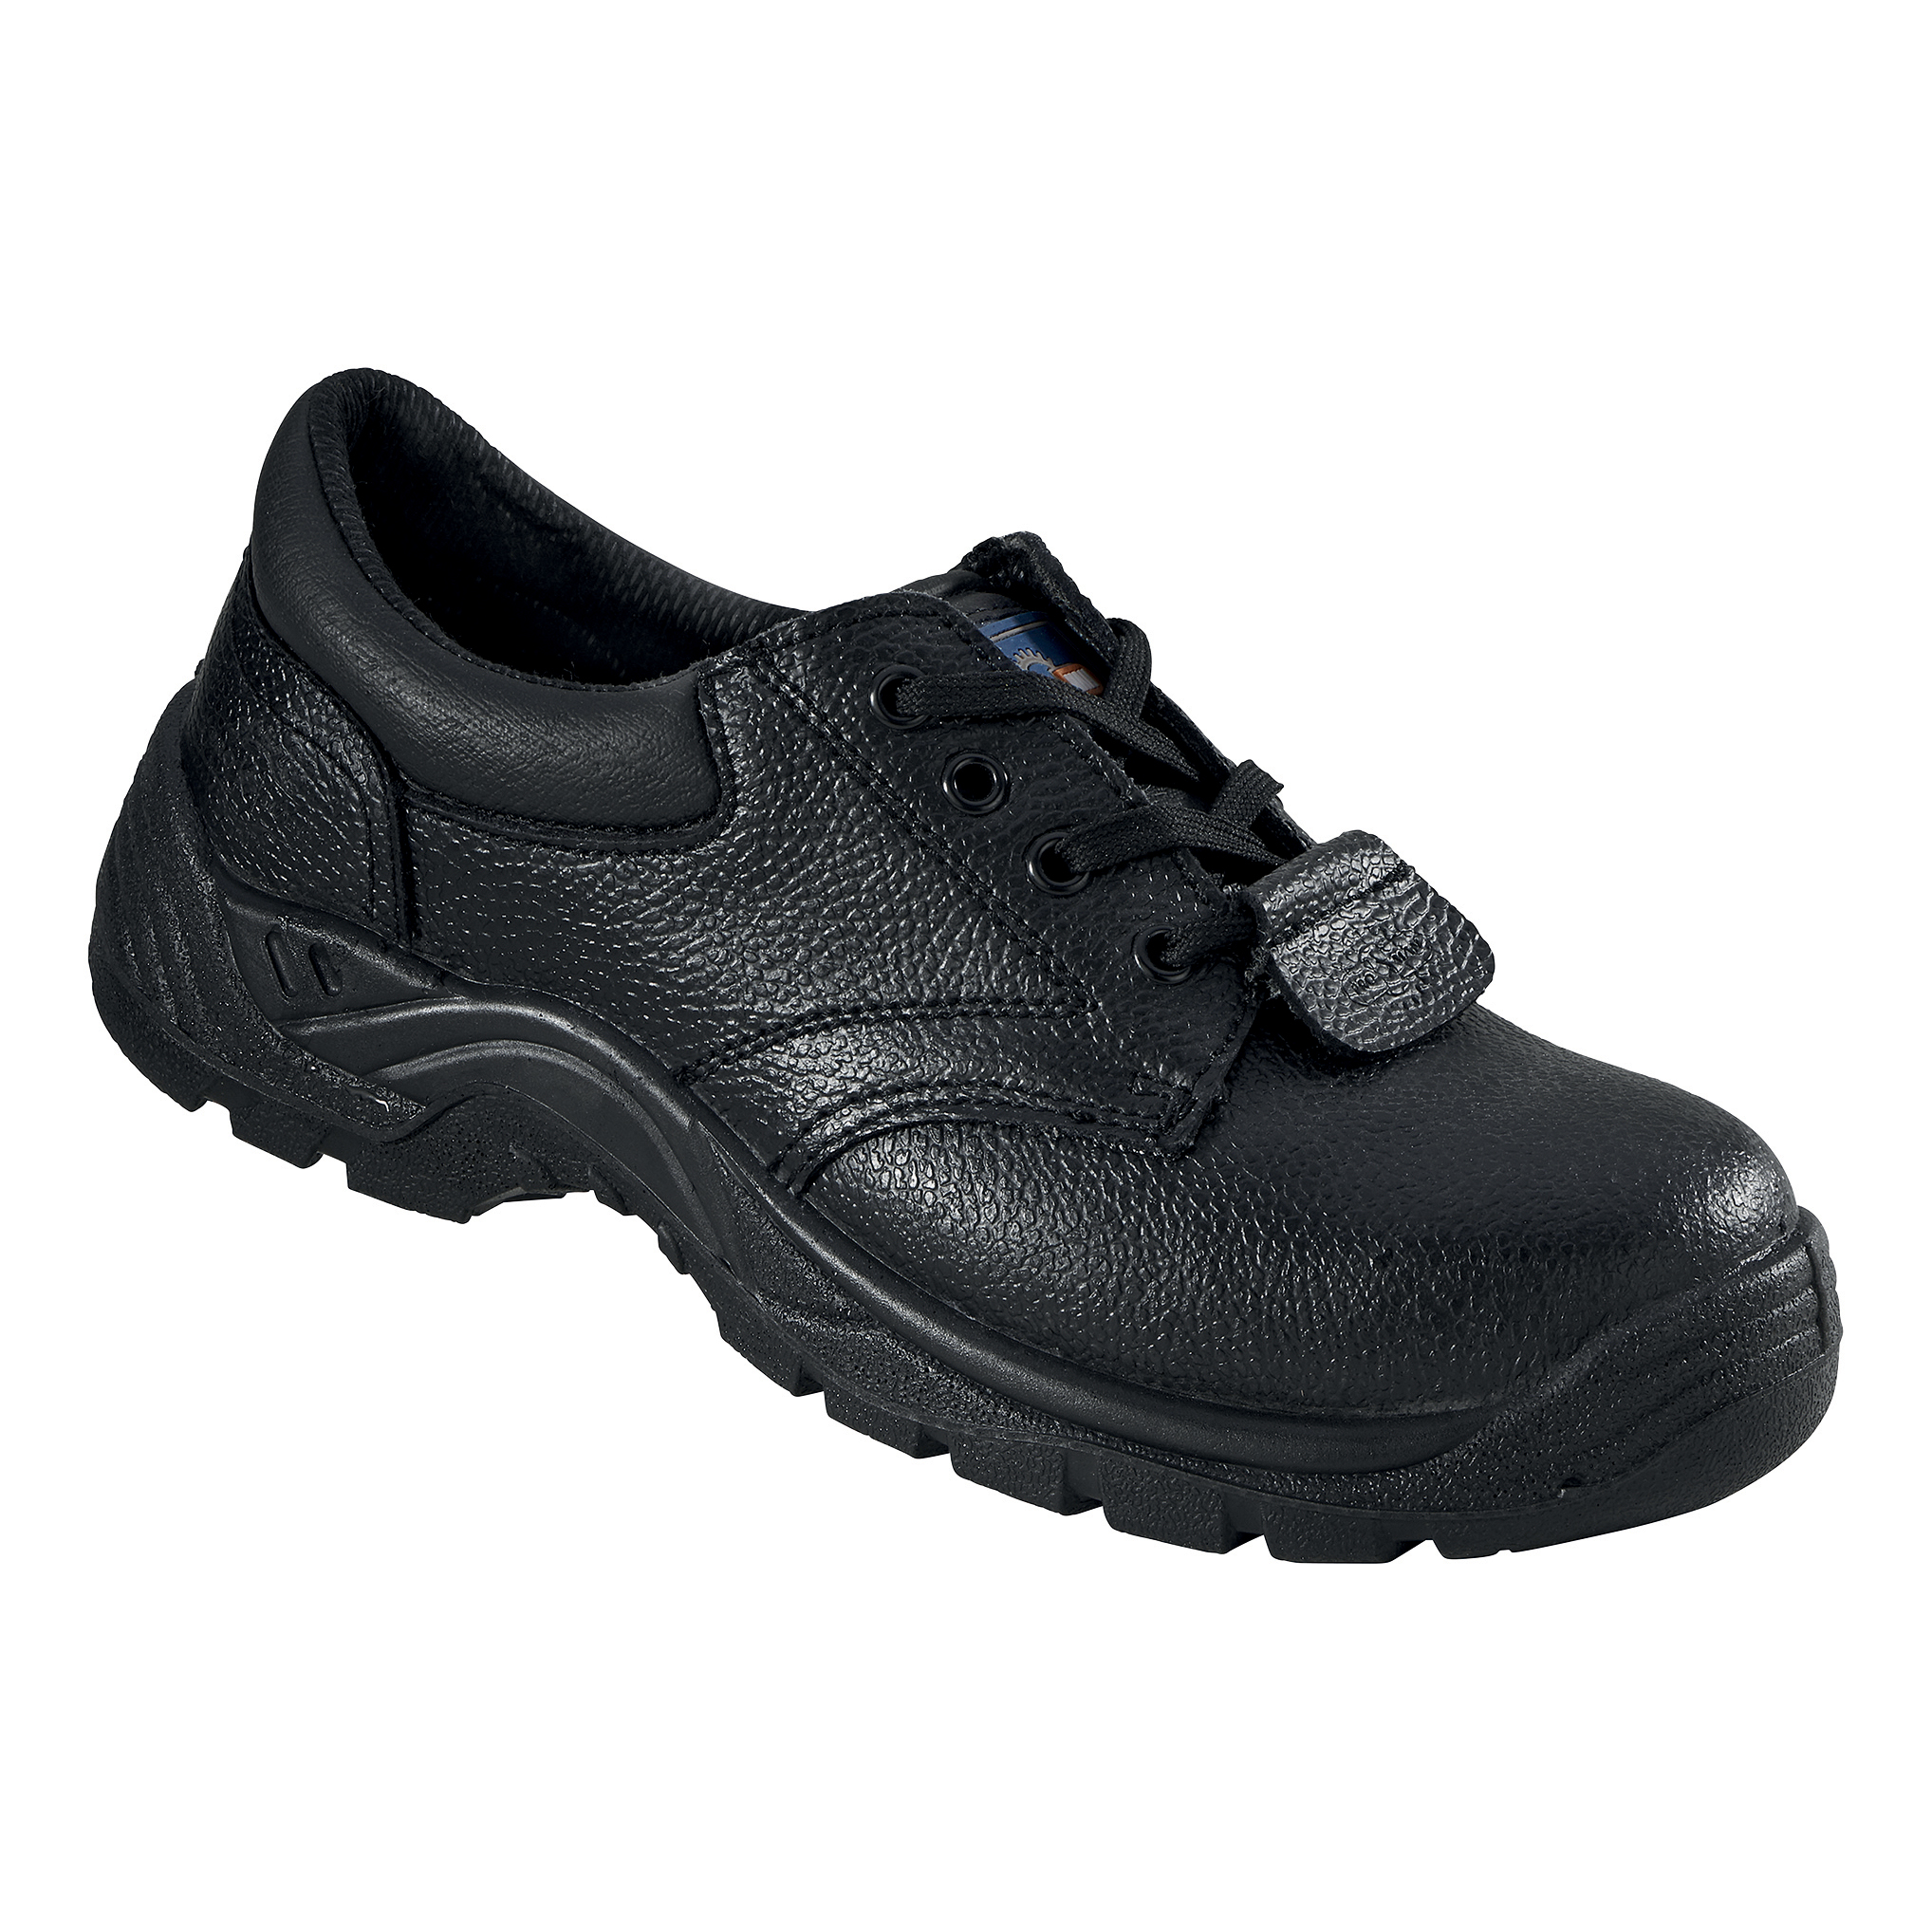 Rockfall ProMan Chukka Shoe Leather Steel Toecap Black Size 6 Ref PM102 6